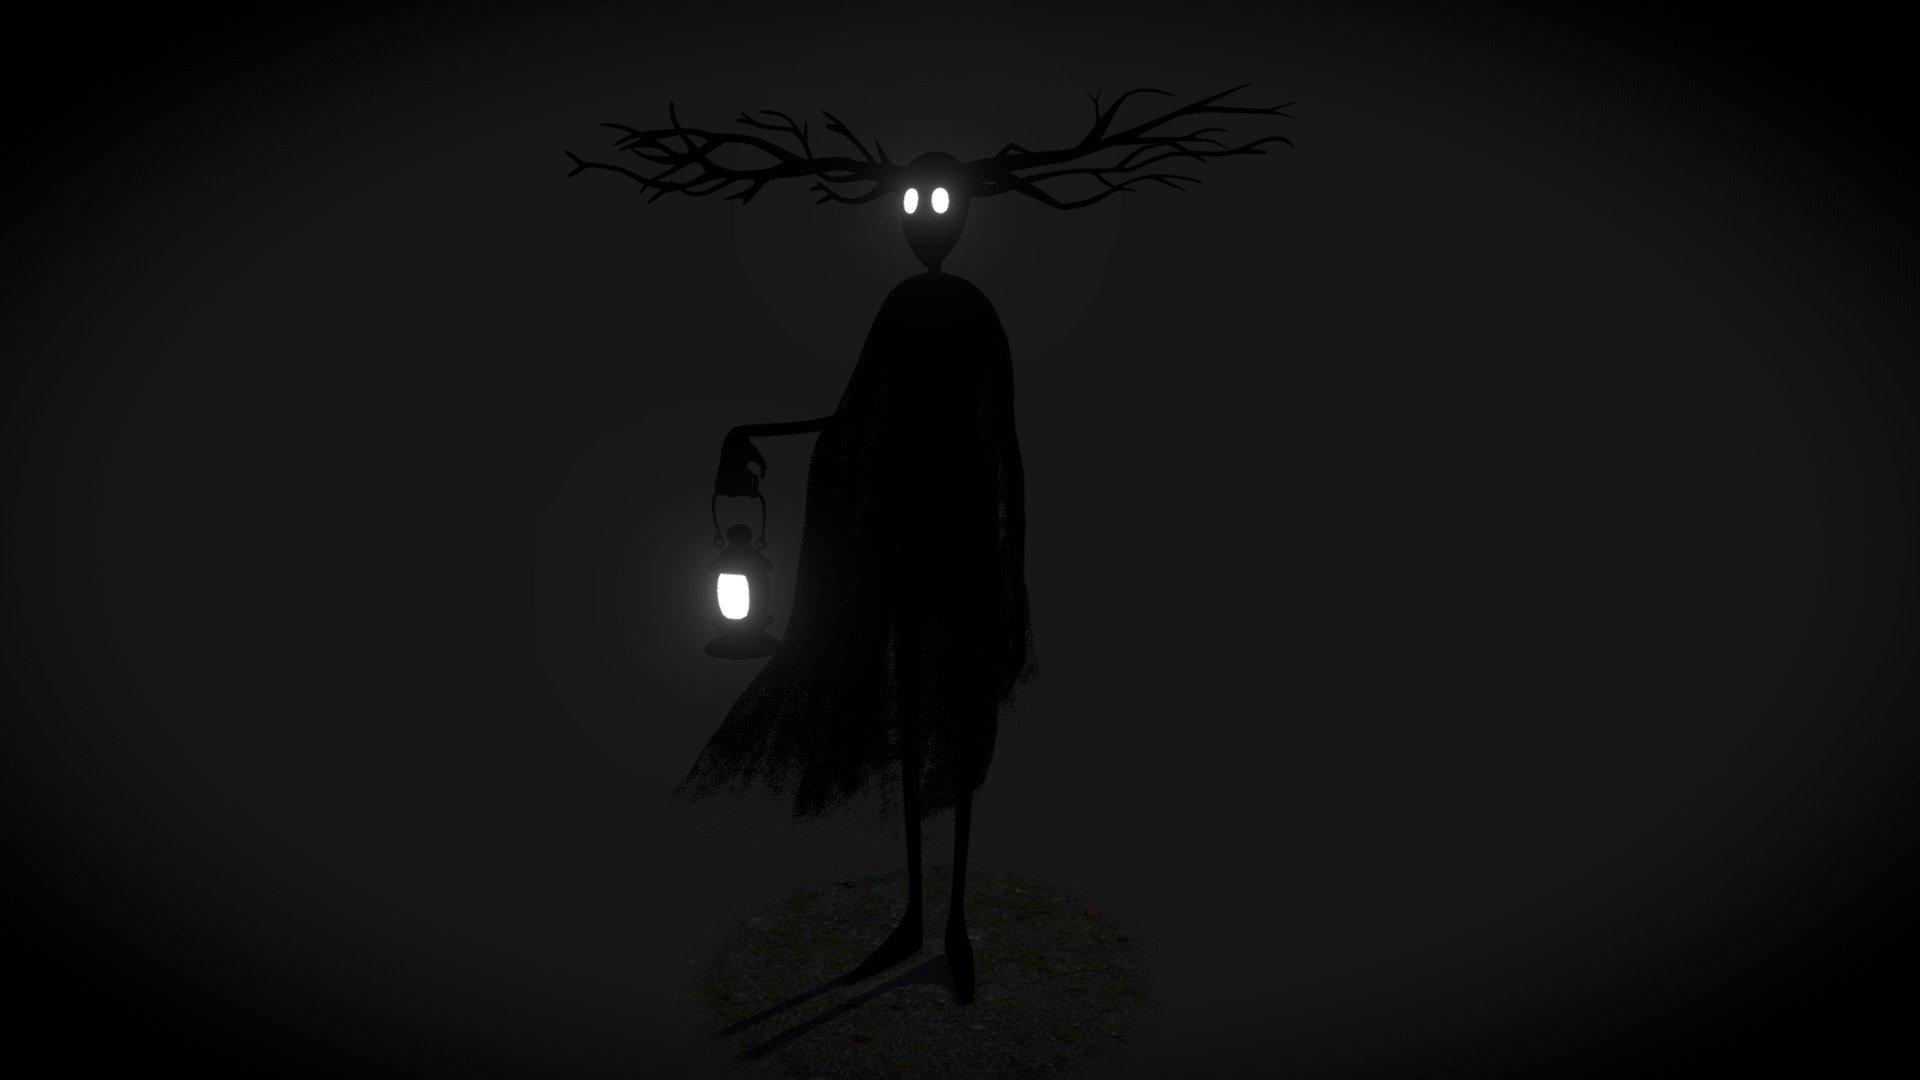 The Beast Over The Garden Wall Darkness 939569 Hd Wallpaper